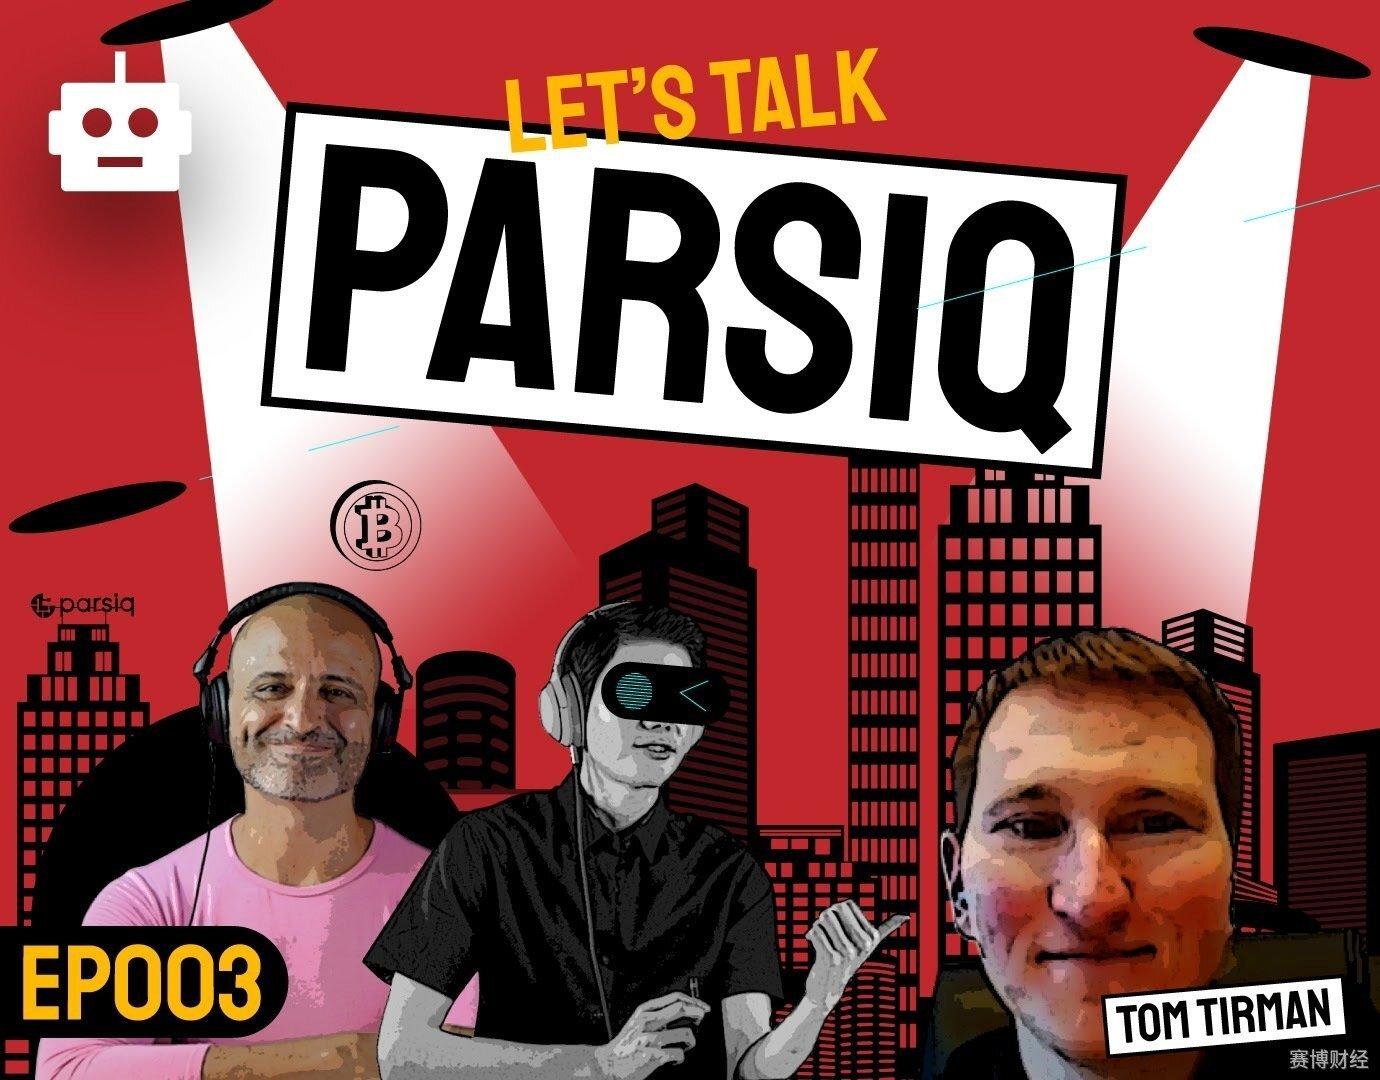 EP003-PARSIQ-ARTICLE